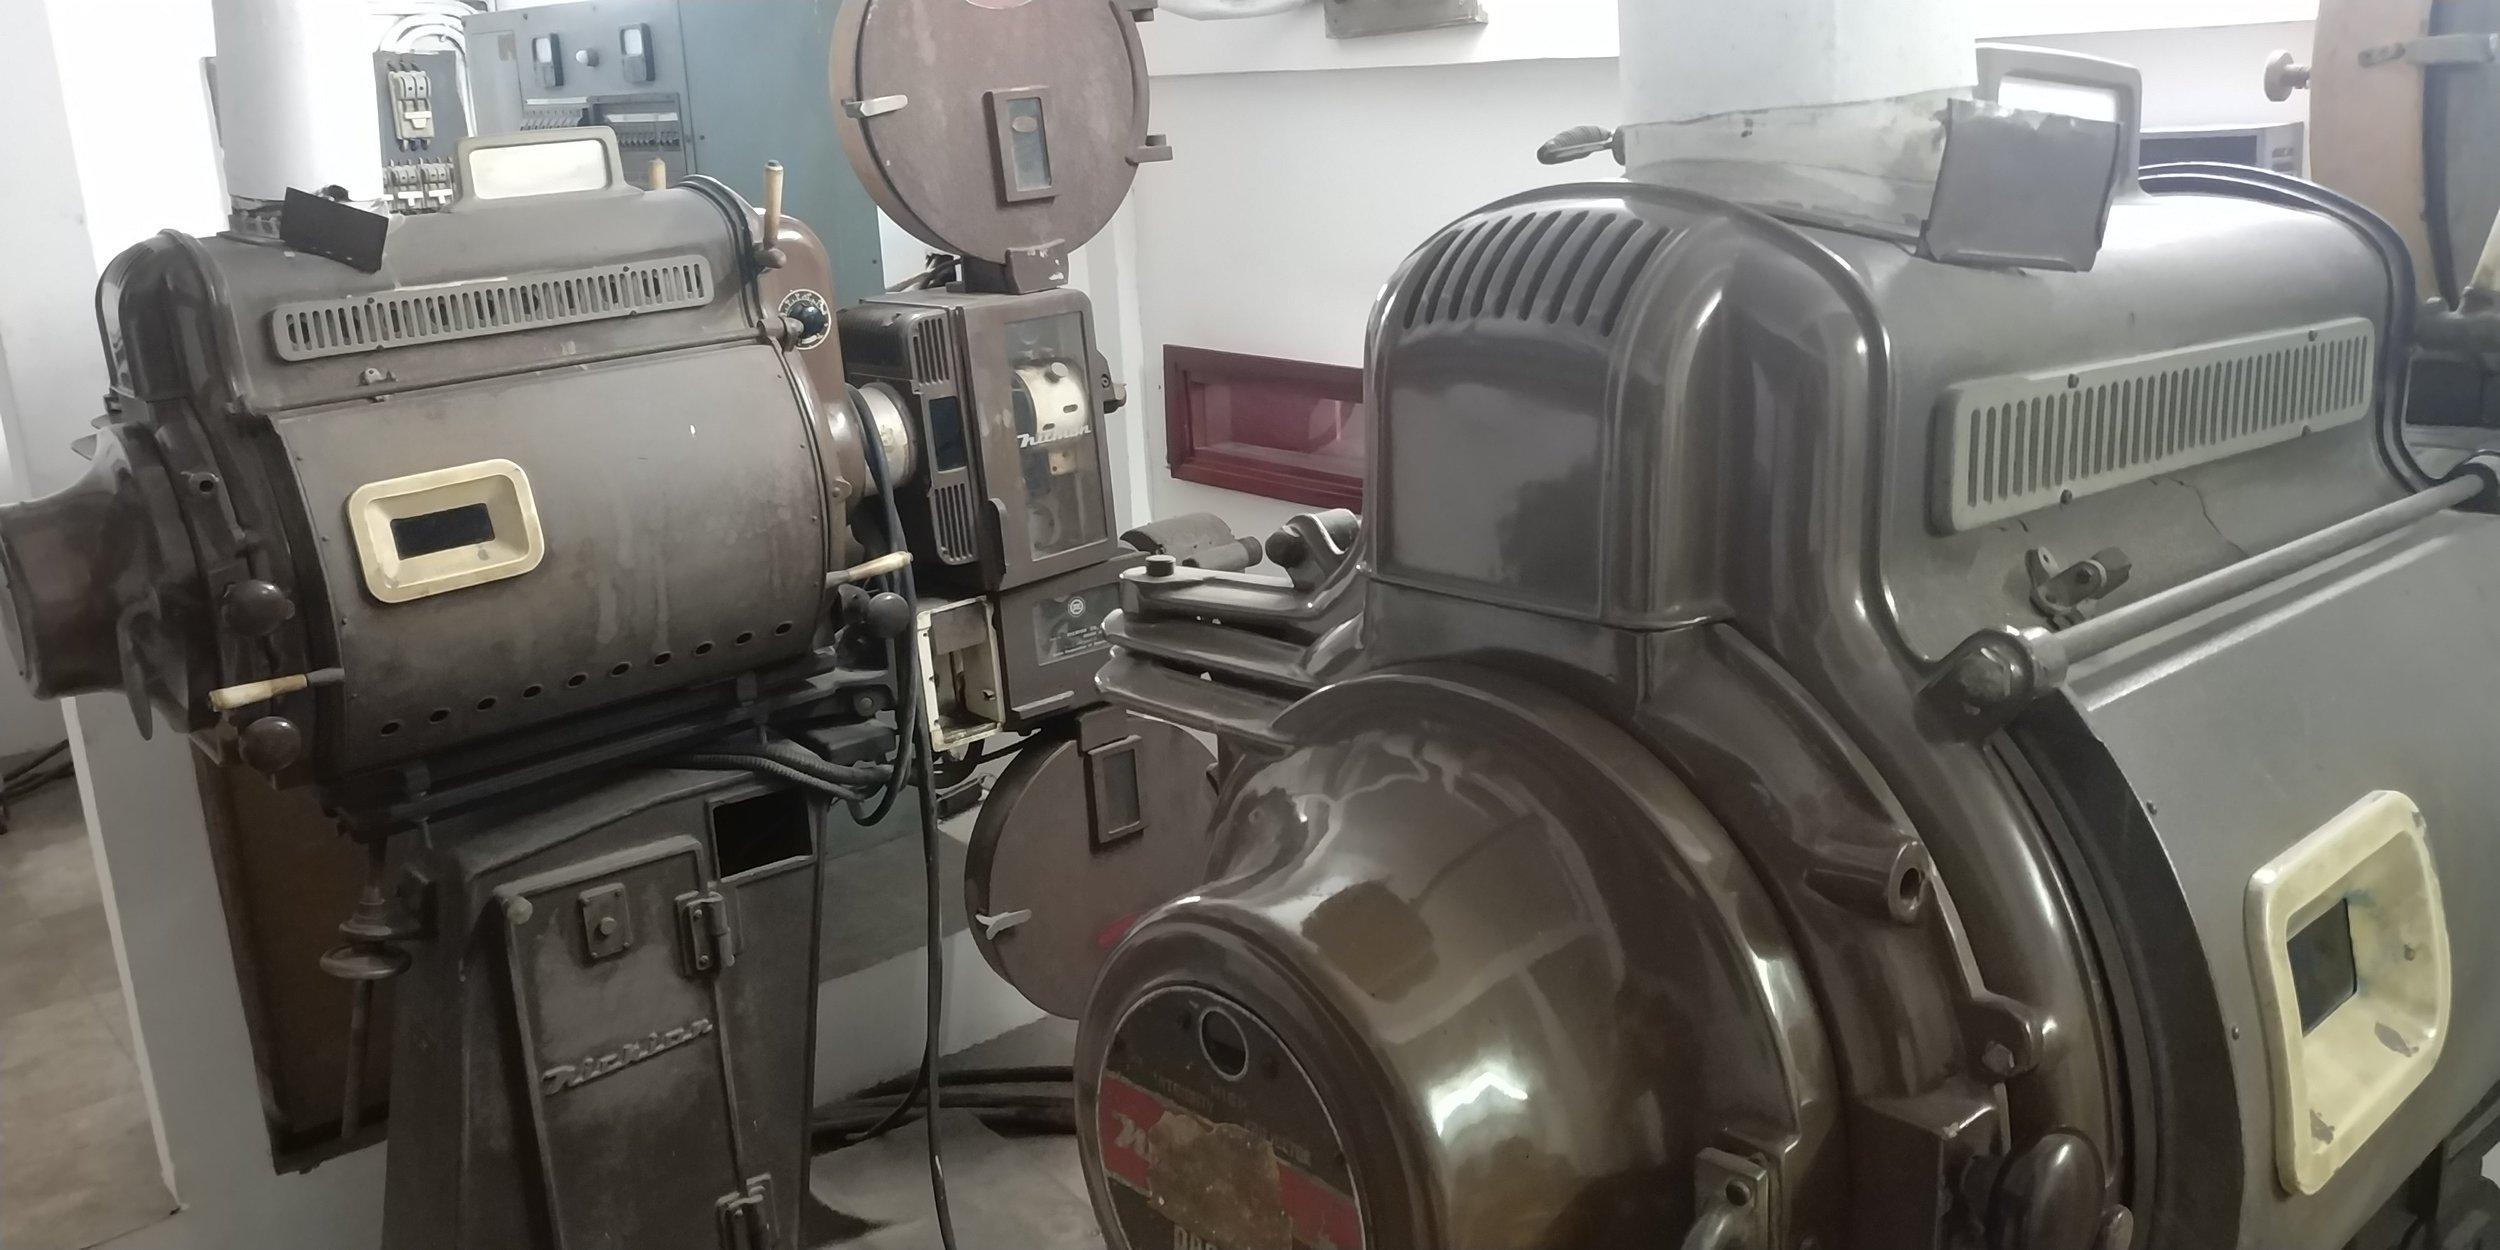 Dual Projectors from the Cold War Era